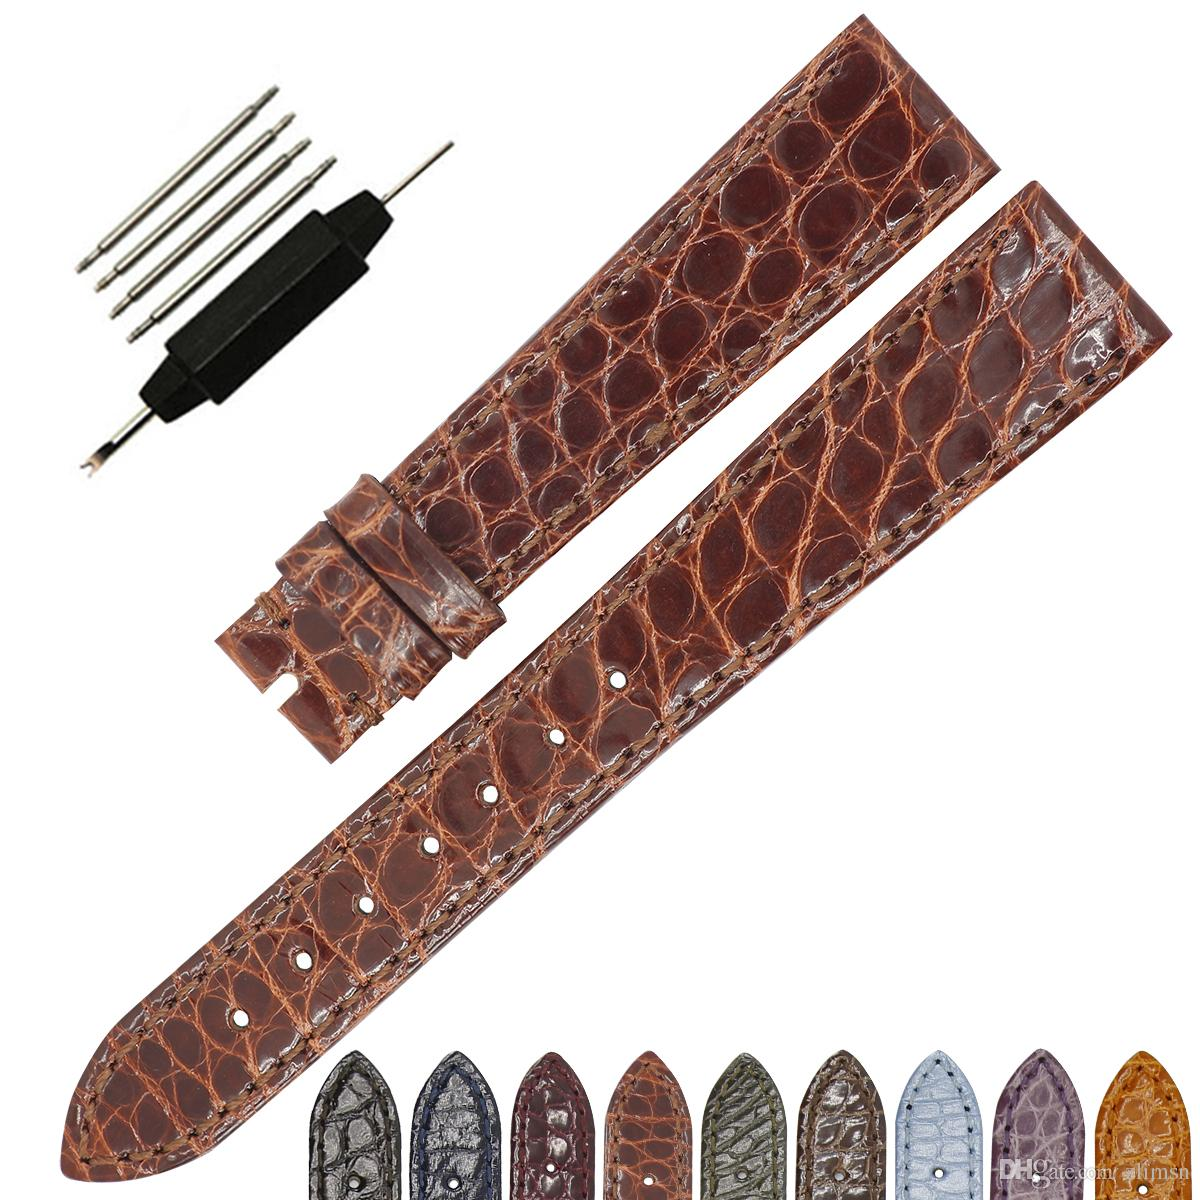 90081a6360f New Arrive ZLIMSN Genuine Crocodile Alligator Skin Leather Watch ...